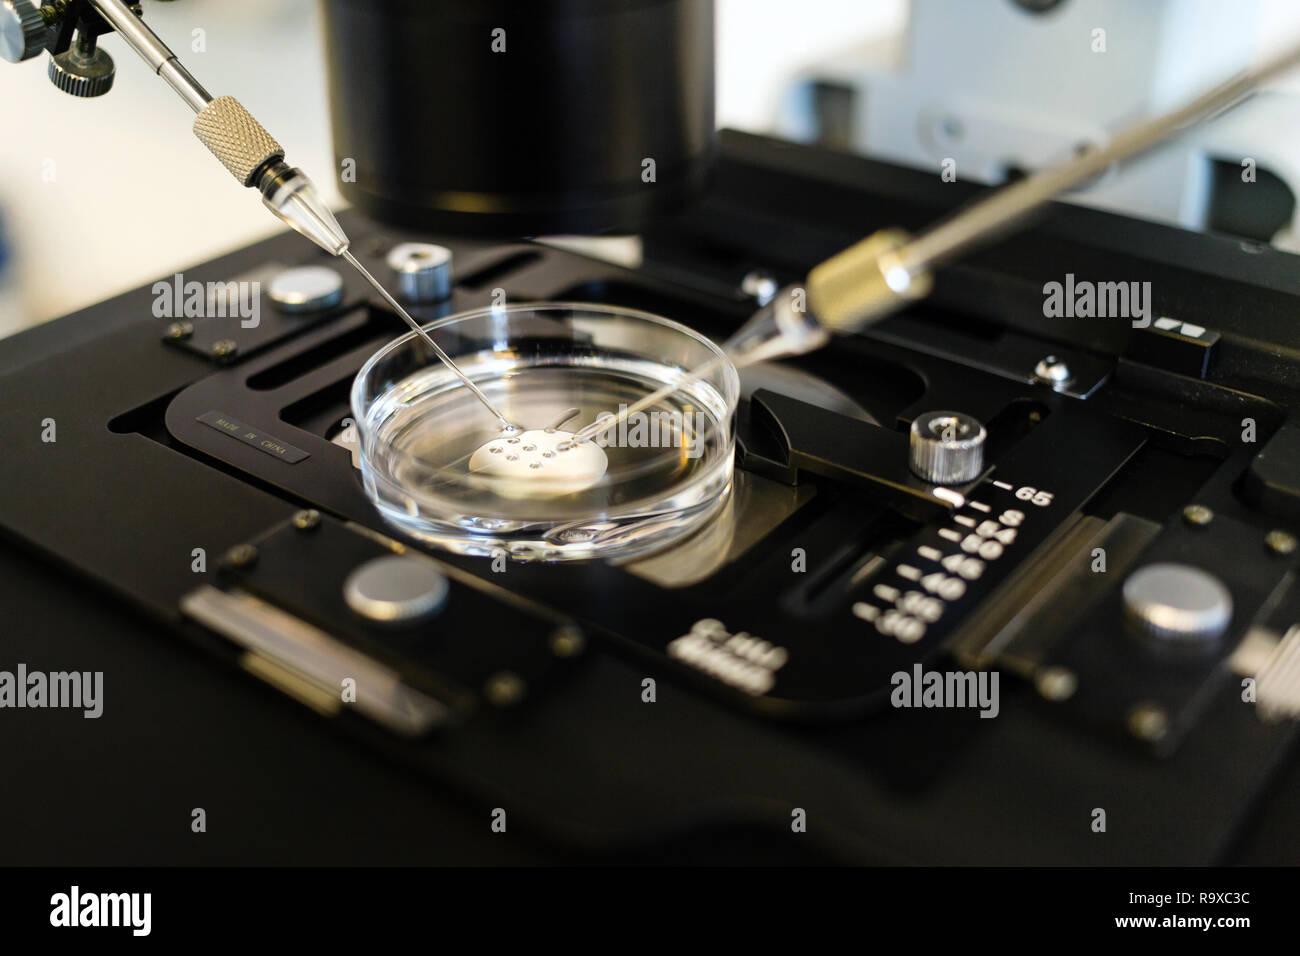 Unter dem mikroskop immagini unter dem mikroskop fotos stock alamy